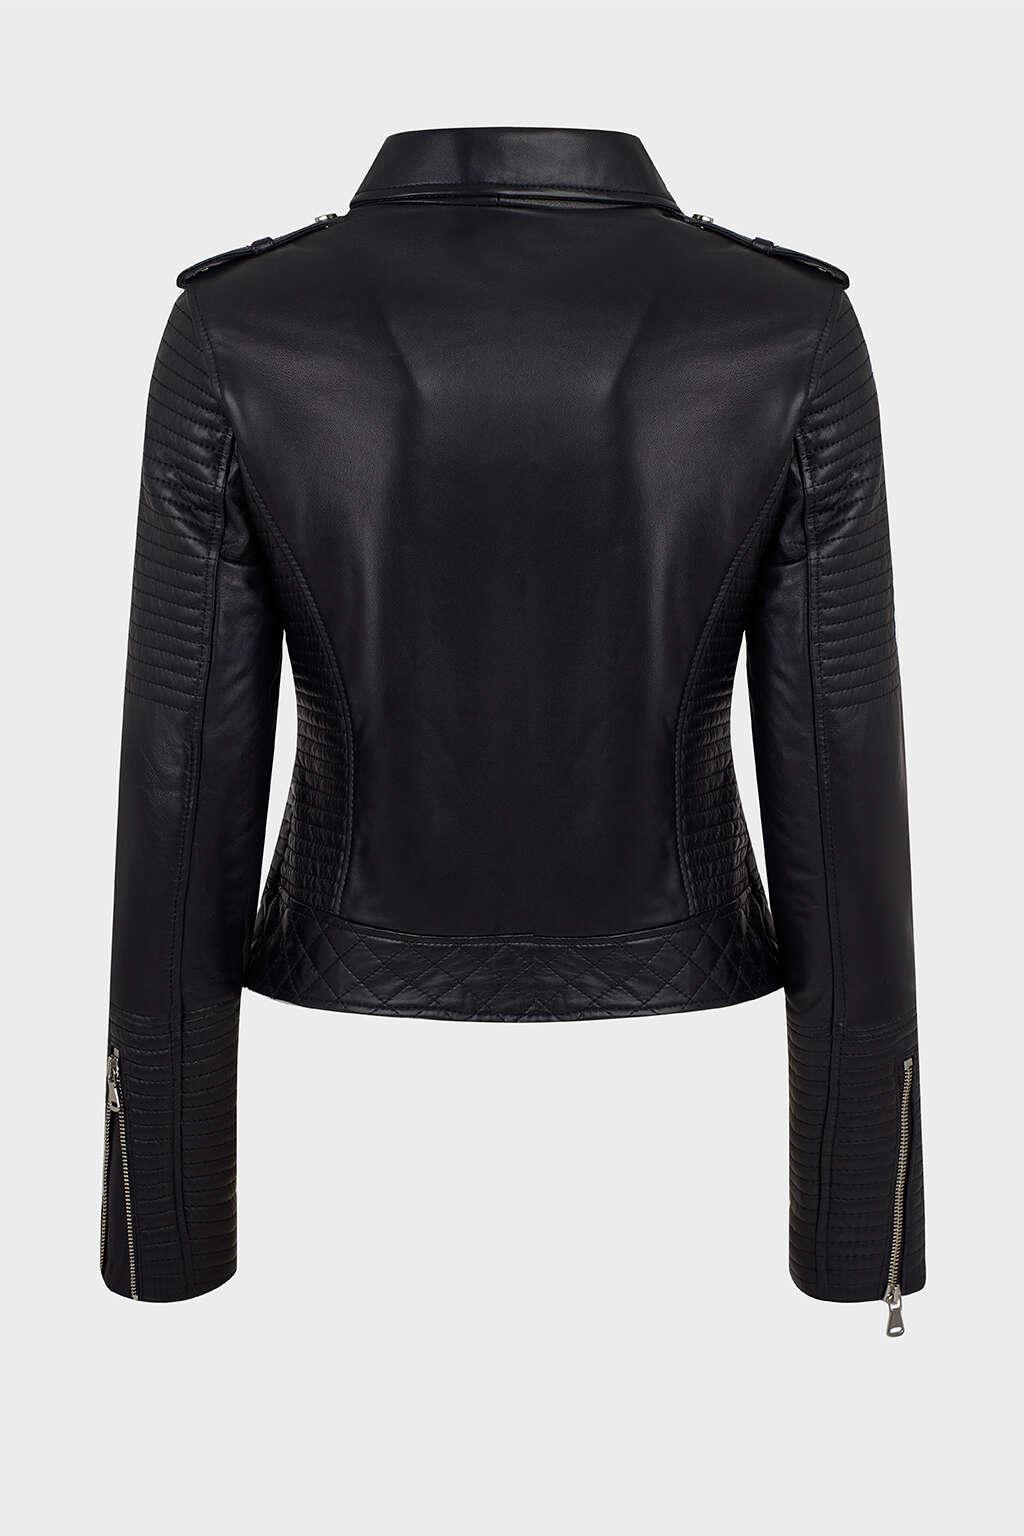 Back of Jet Black Ribbed Moto Leather Jacket